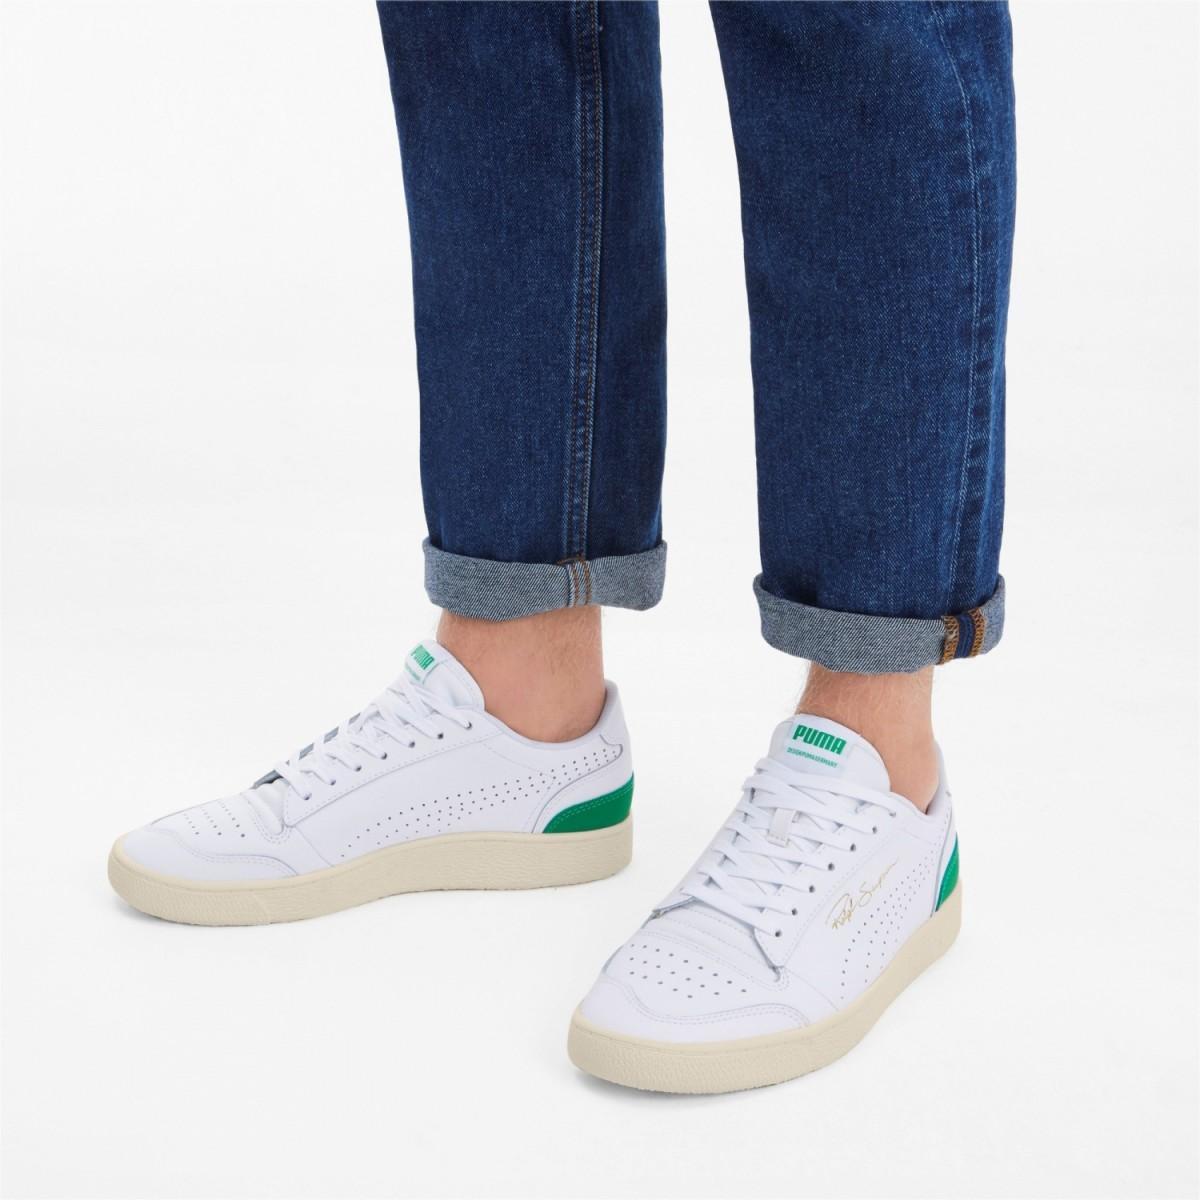 Puma Ralph Sampson Lo Perf Soft Sneaker